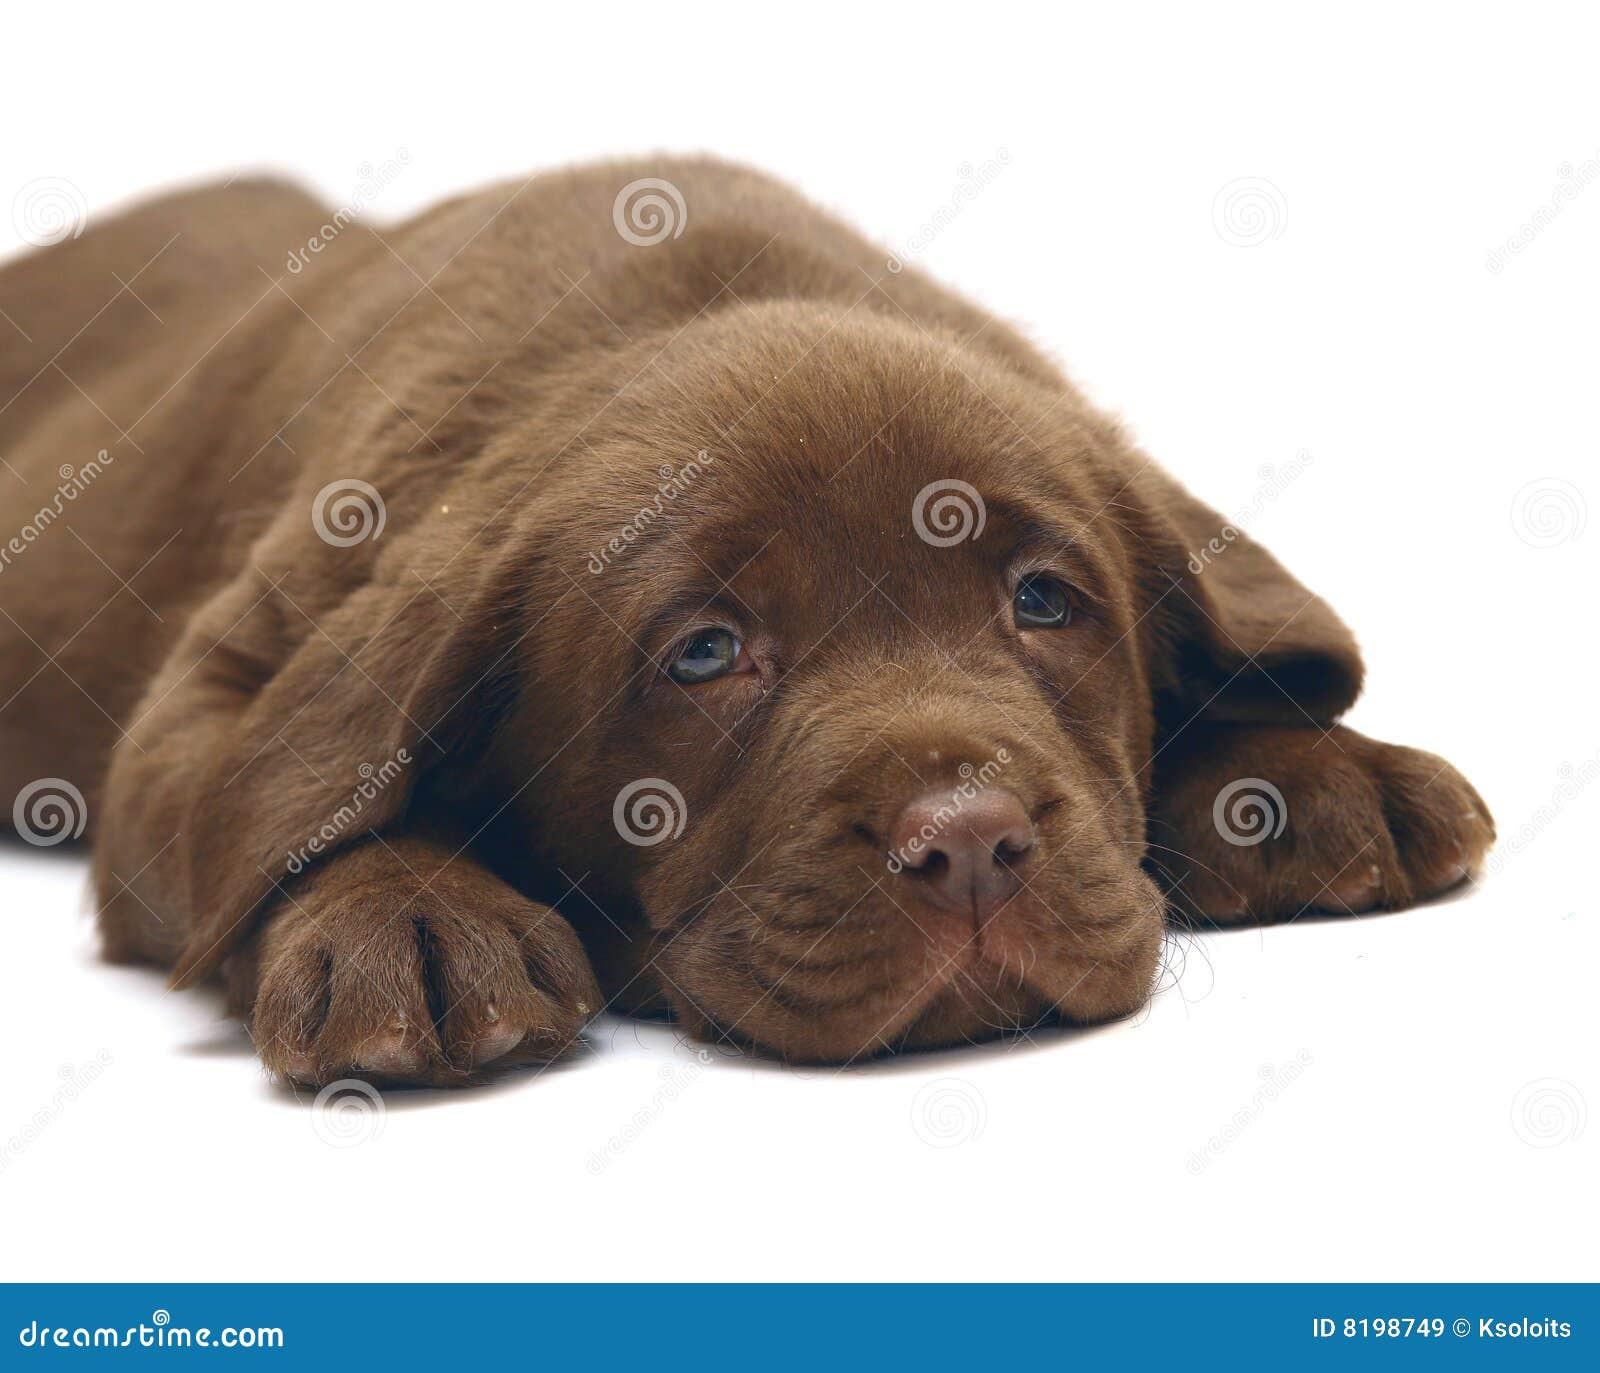 chocolate puppy Labrador. The puppy of breed Labrador Retriever.